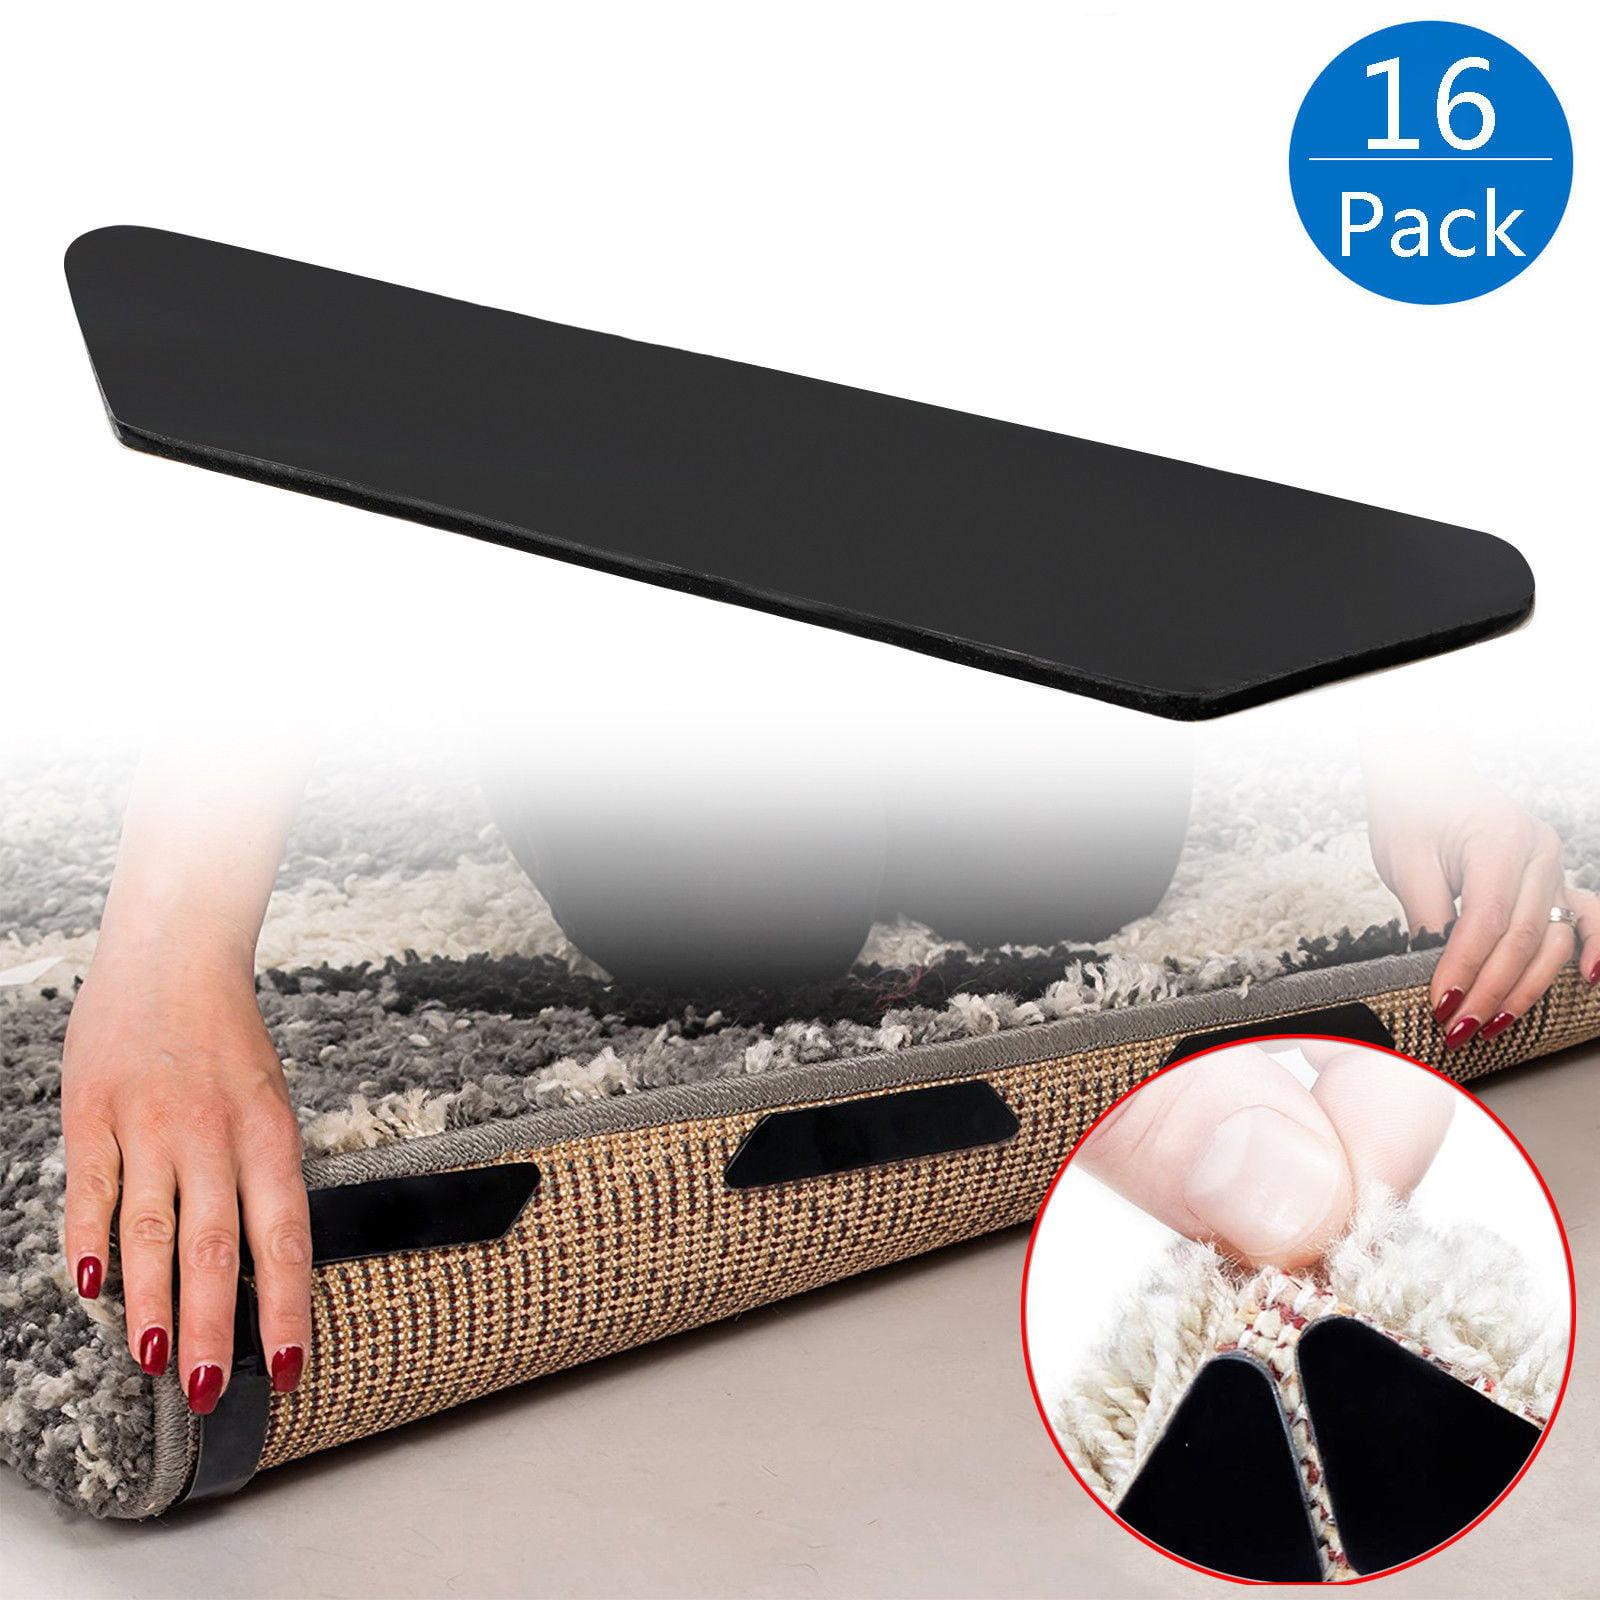 16 Pack Anti Curling Rug Grippers. Anti Slip Straight Carpet Gripper for Corners and Edges Anti Slip Rug Pad for Rugs... by EEEKit